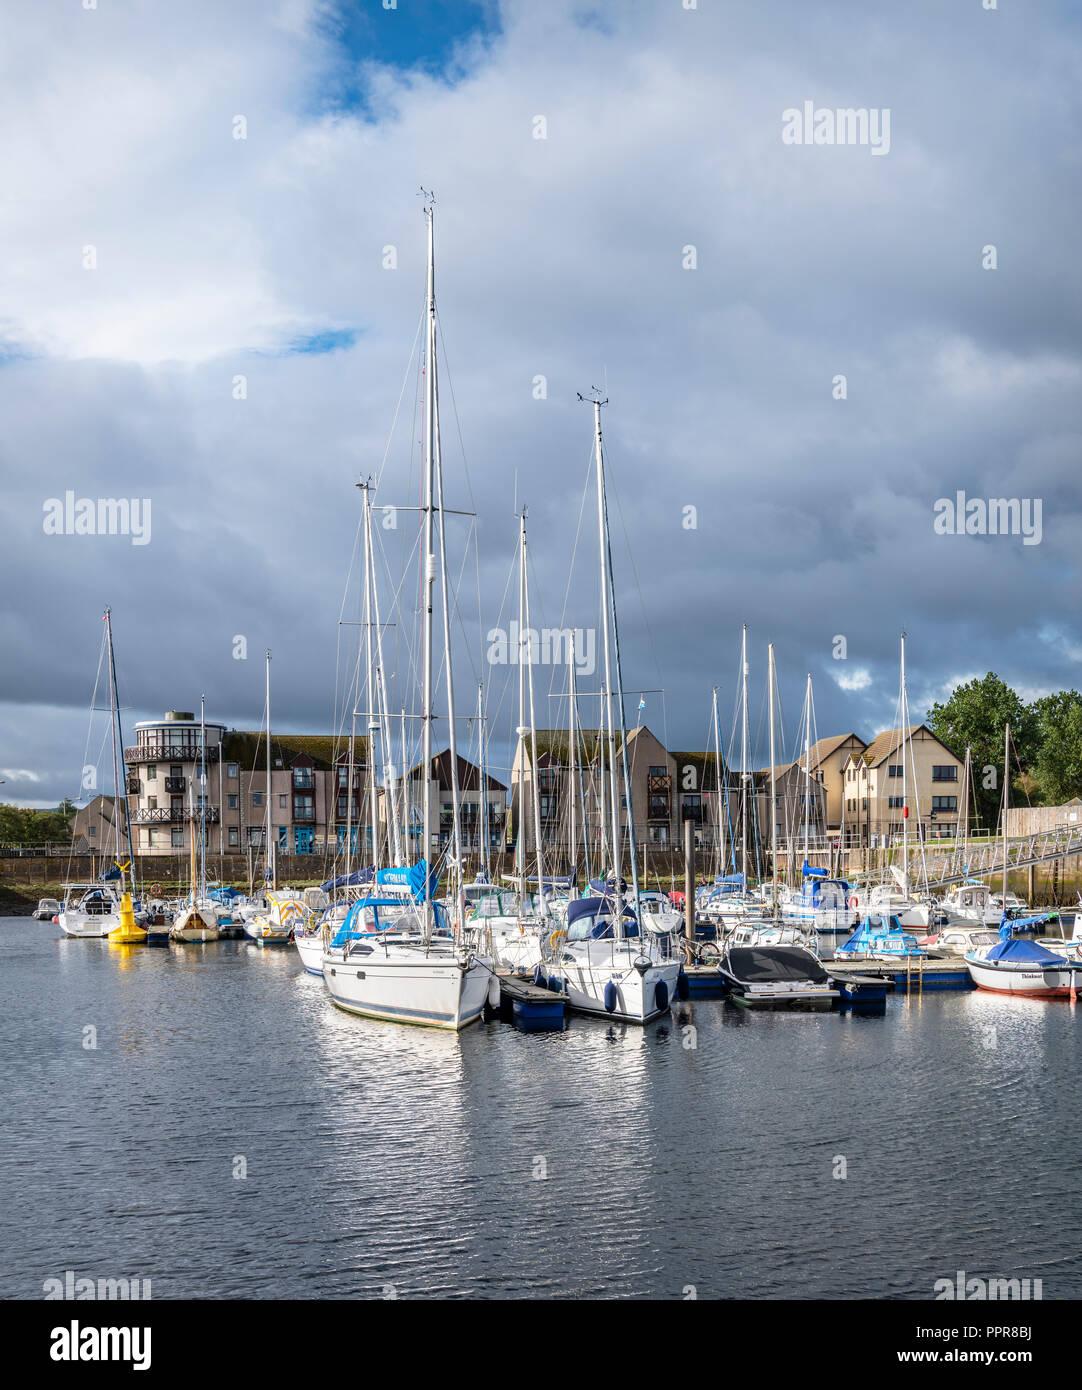 Nairn Harbour, Highlands, Scotland - Stock Image